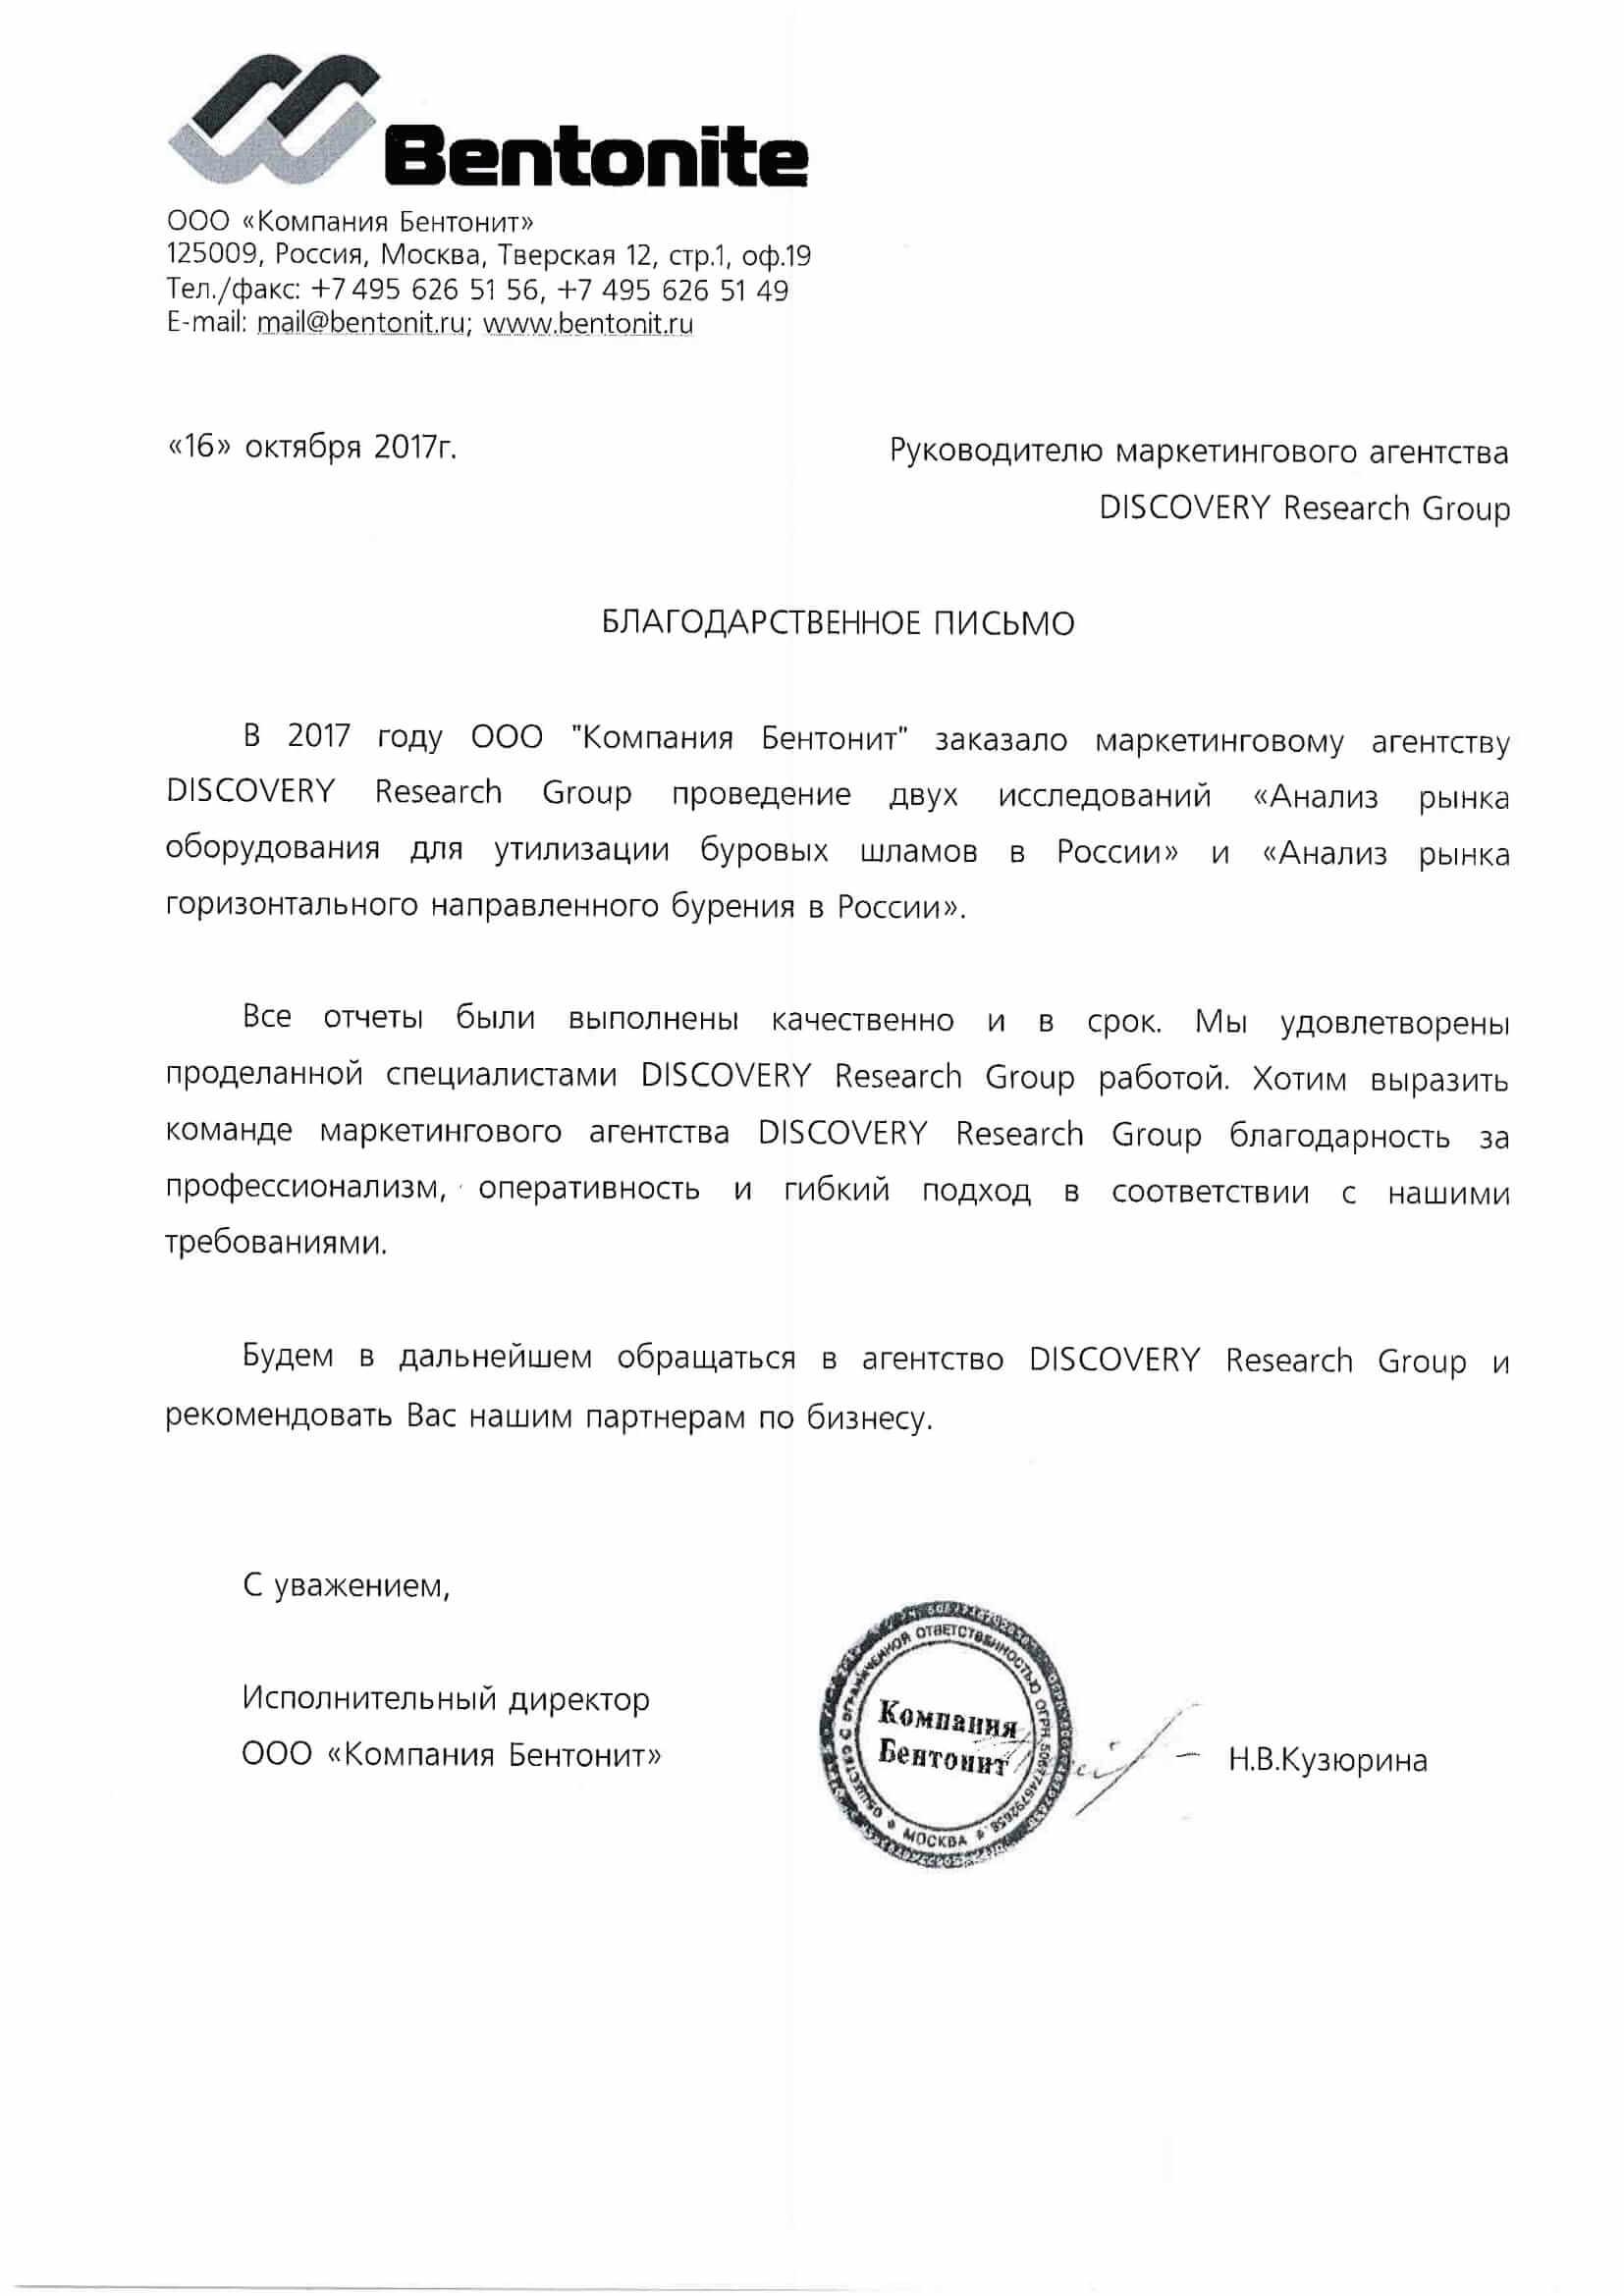 http://drgroup.ru/images/bentonit-pismo.jpg